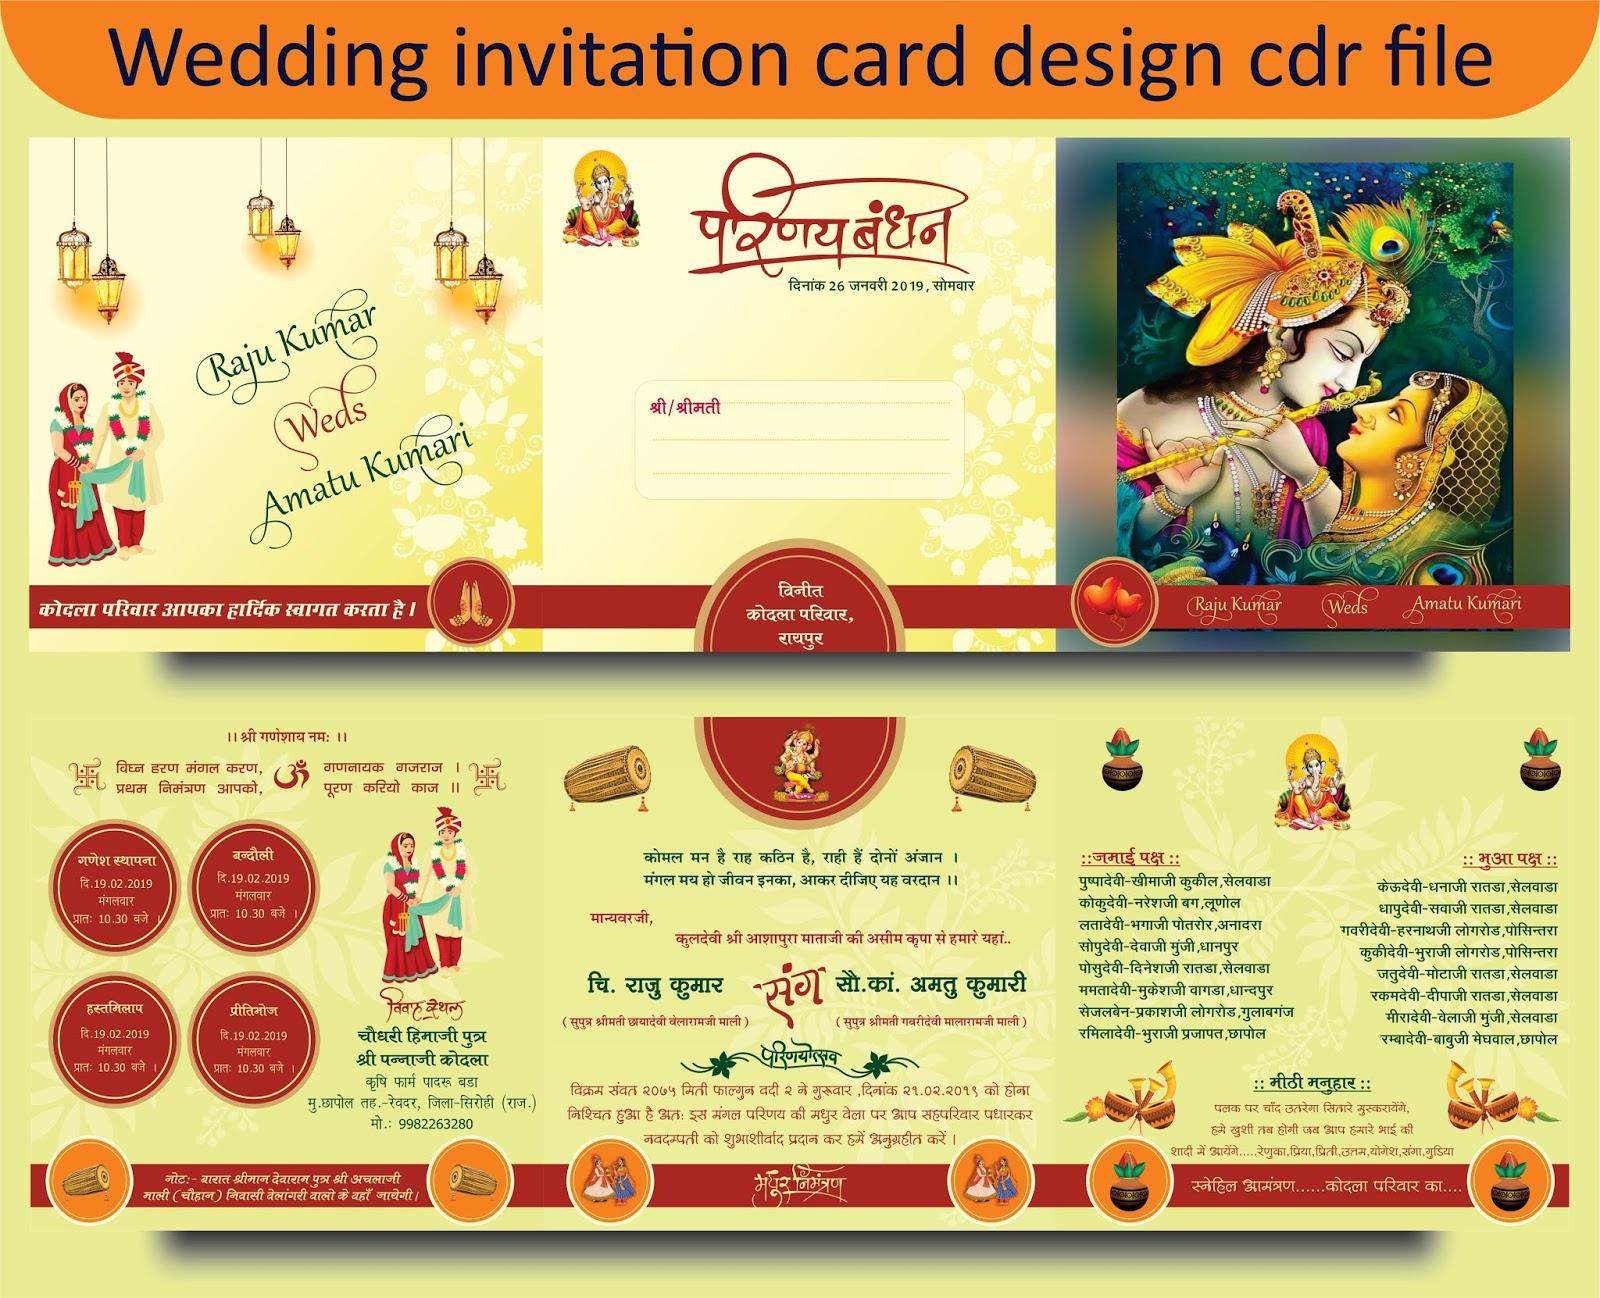 wedding invitation card design cdr file